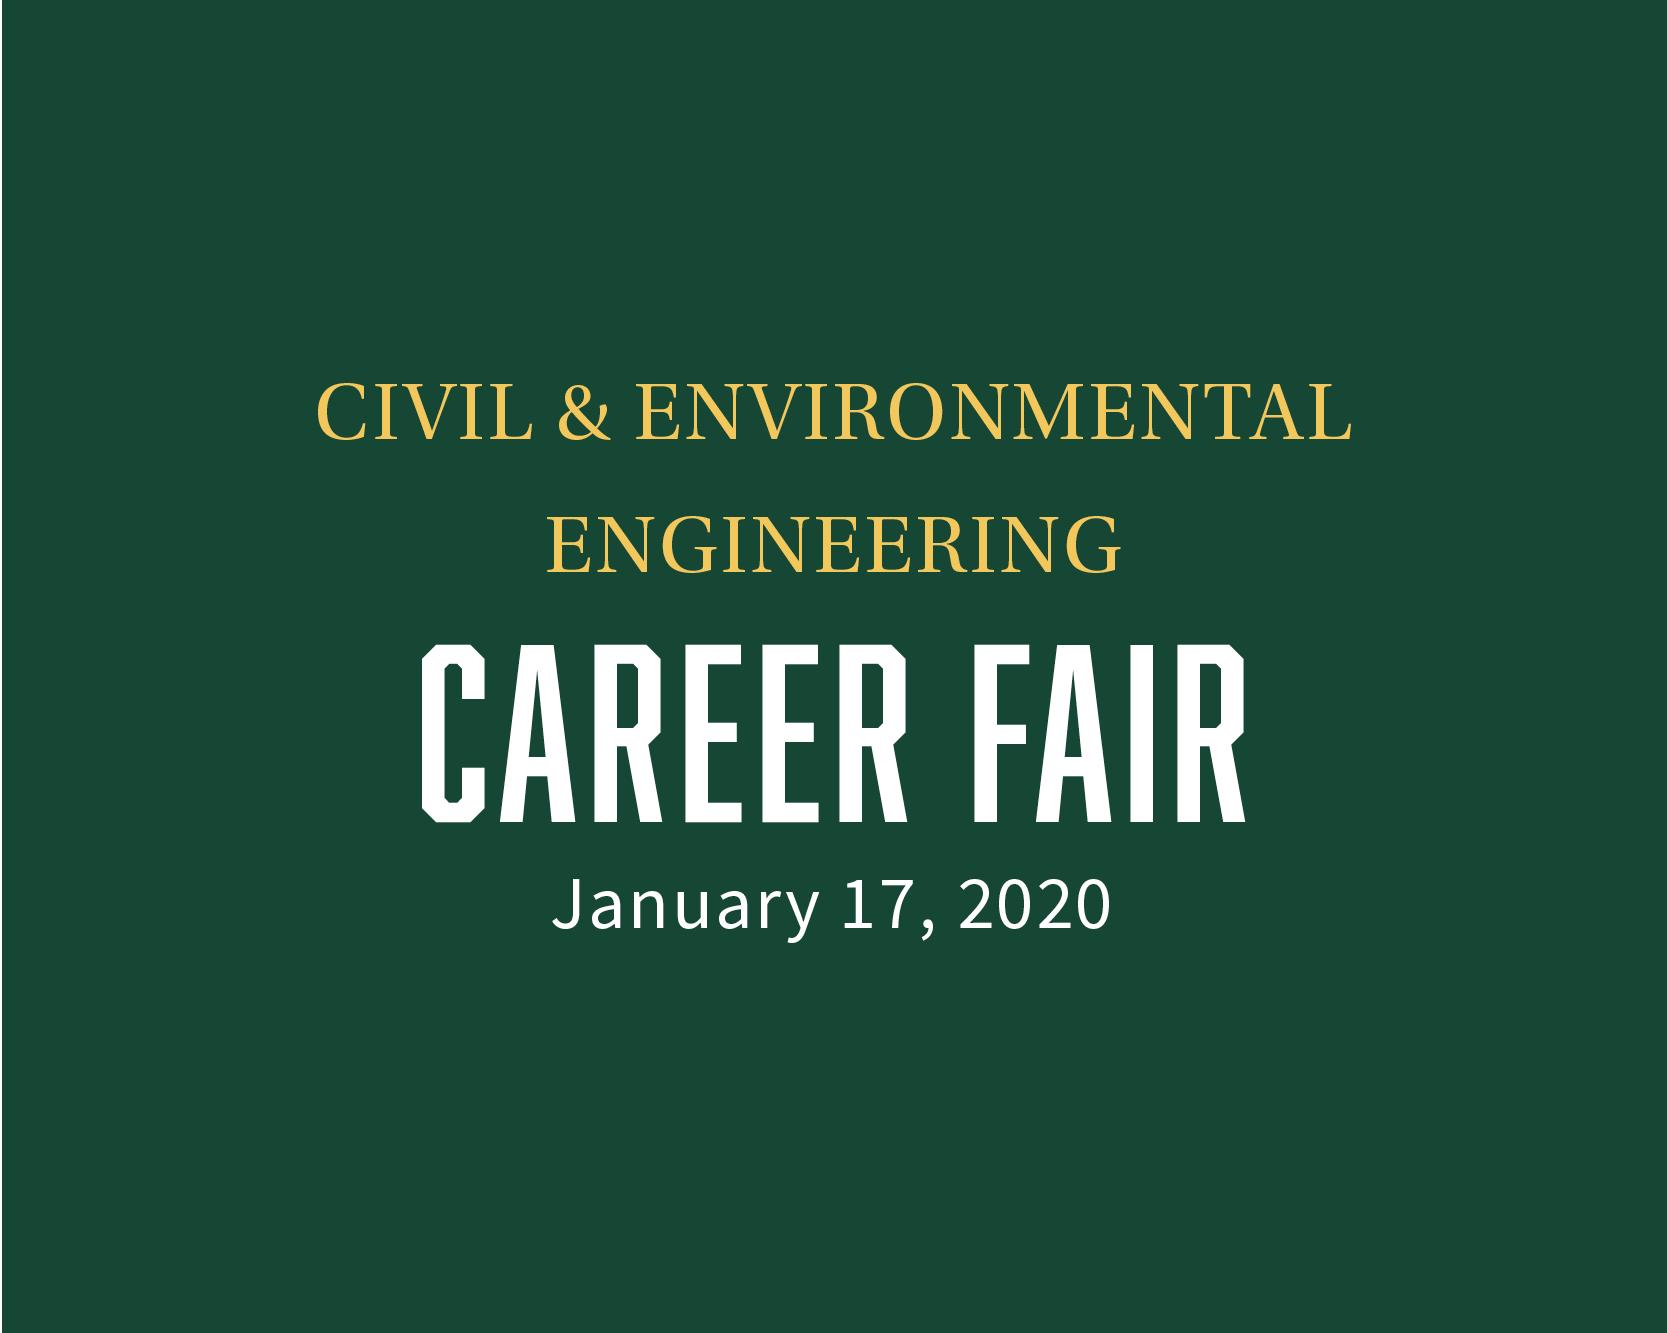 Civil and Environmental Engineering Career Fair